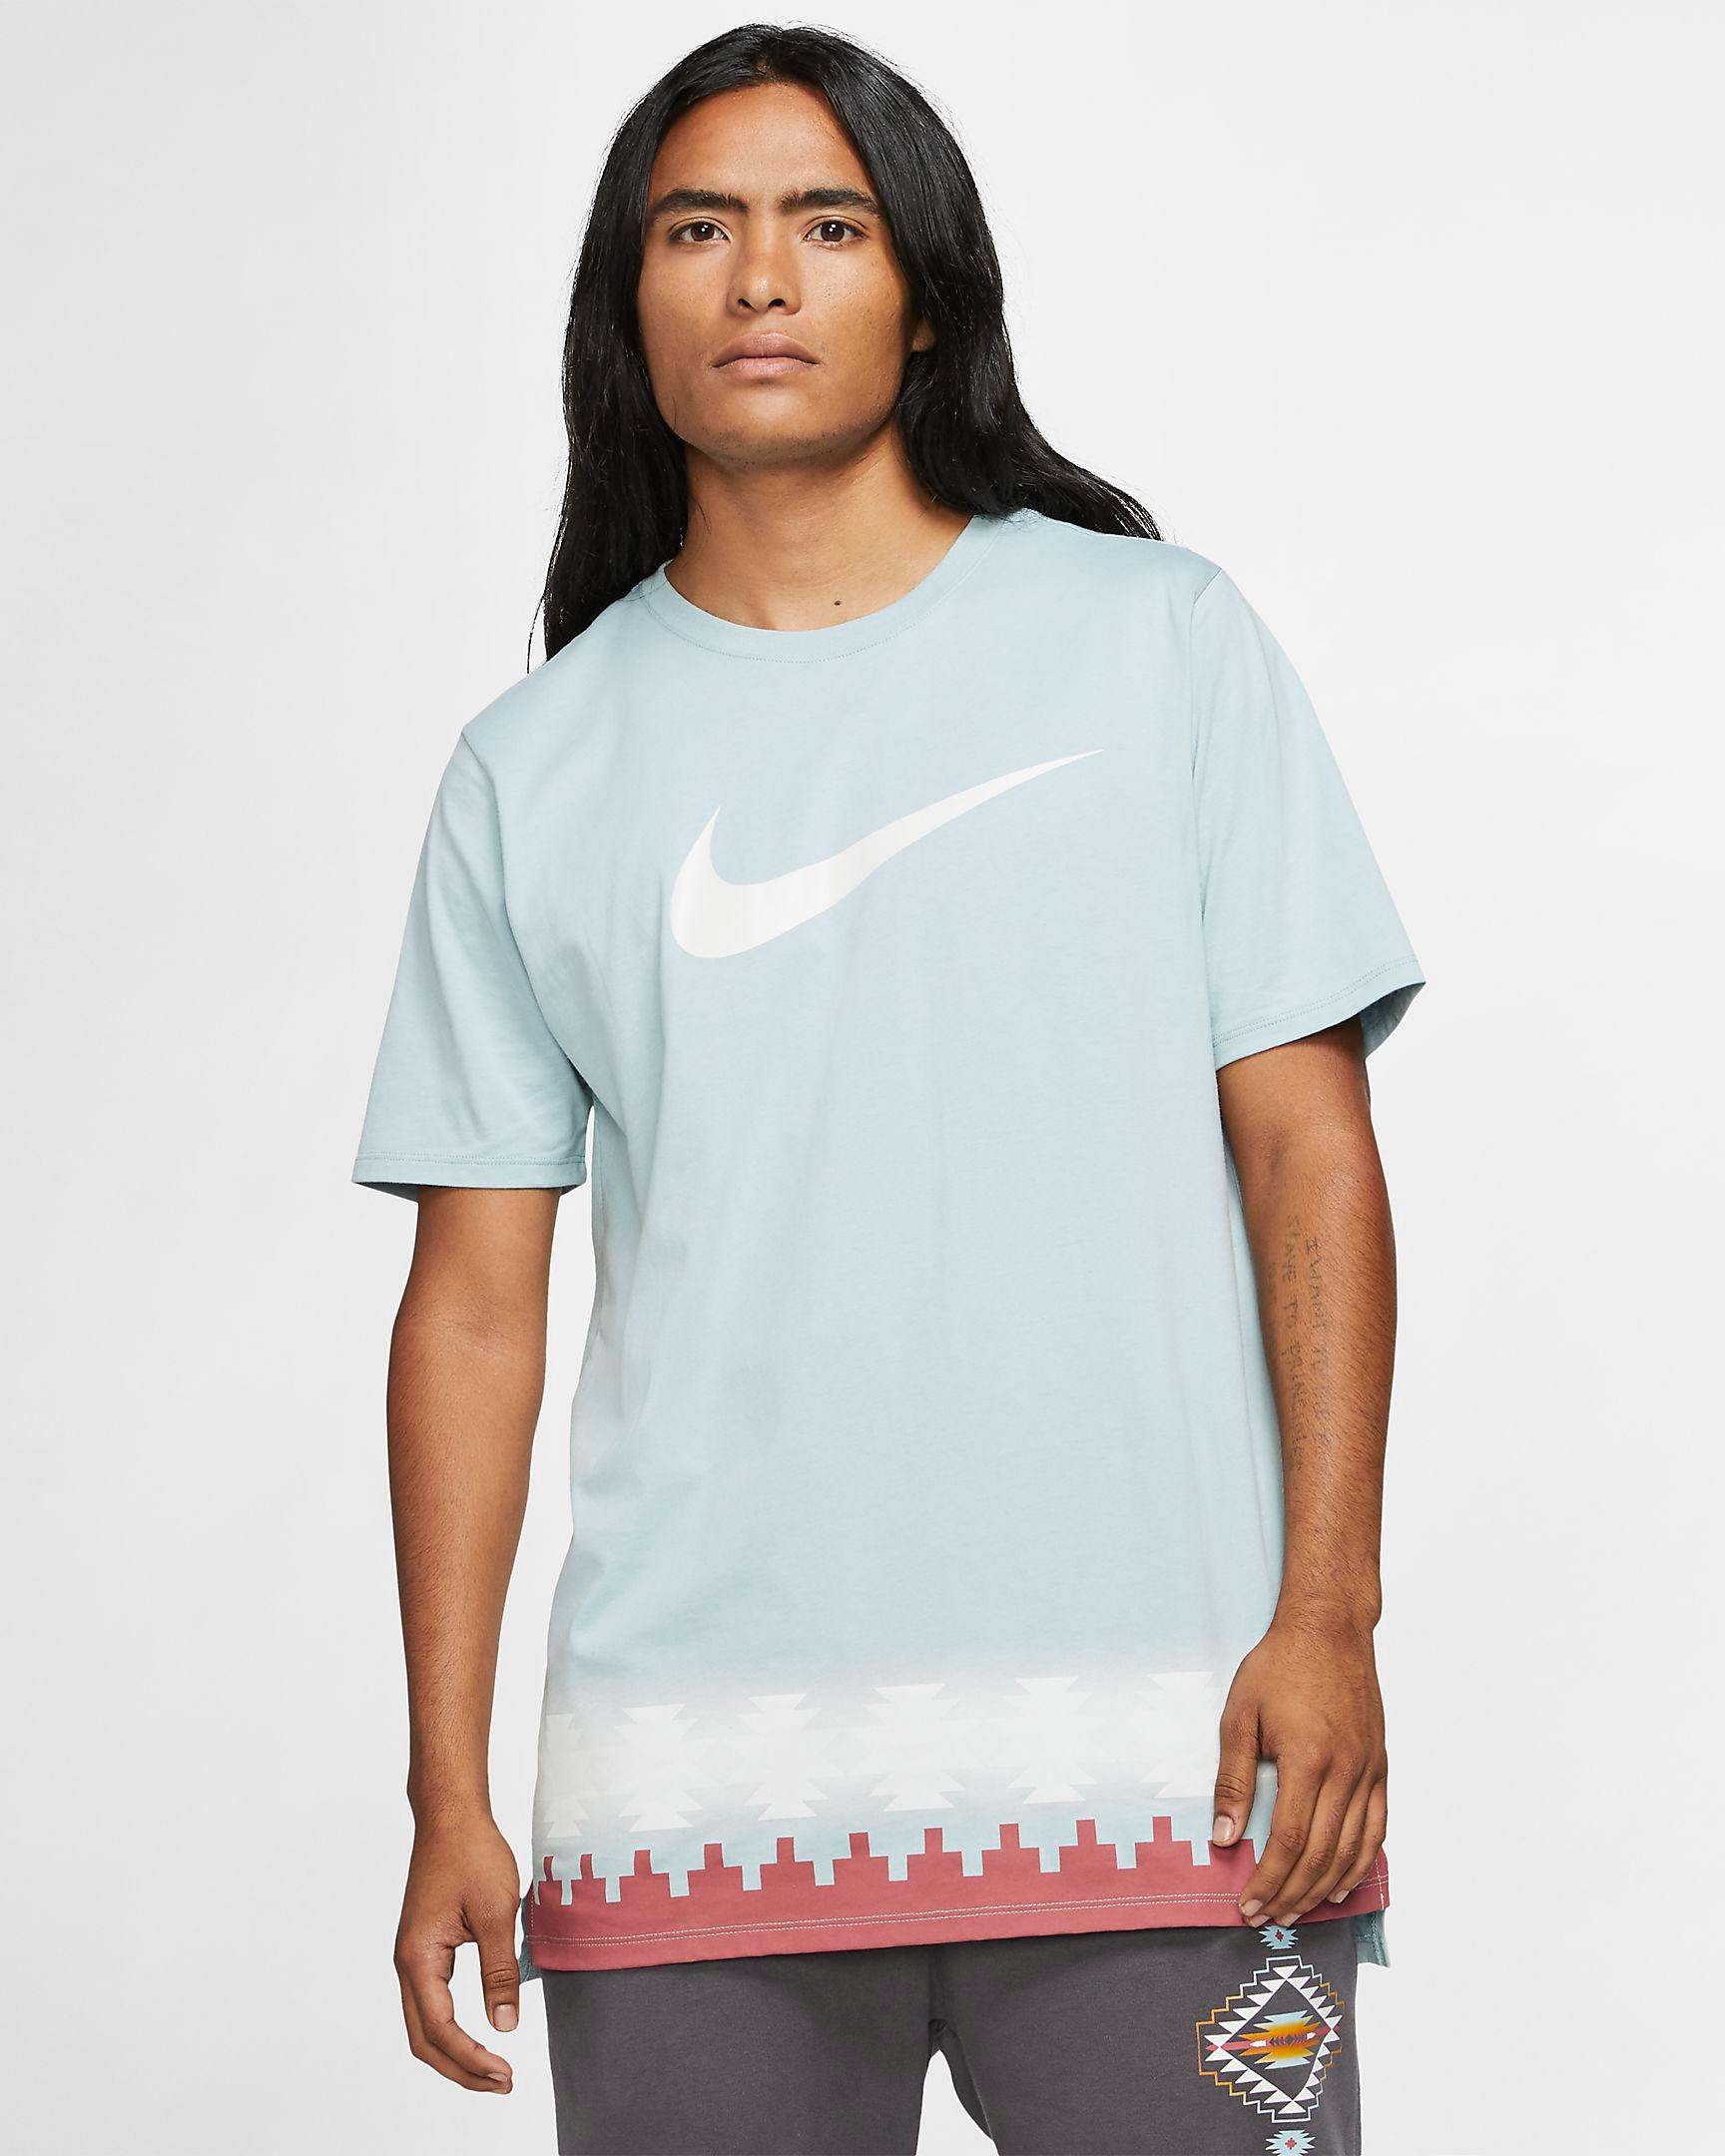 jordan-8-n7-nike-shirt-1